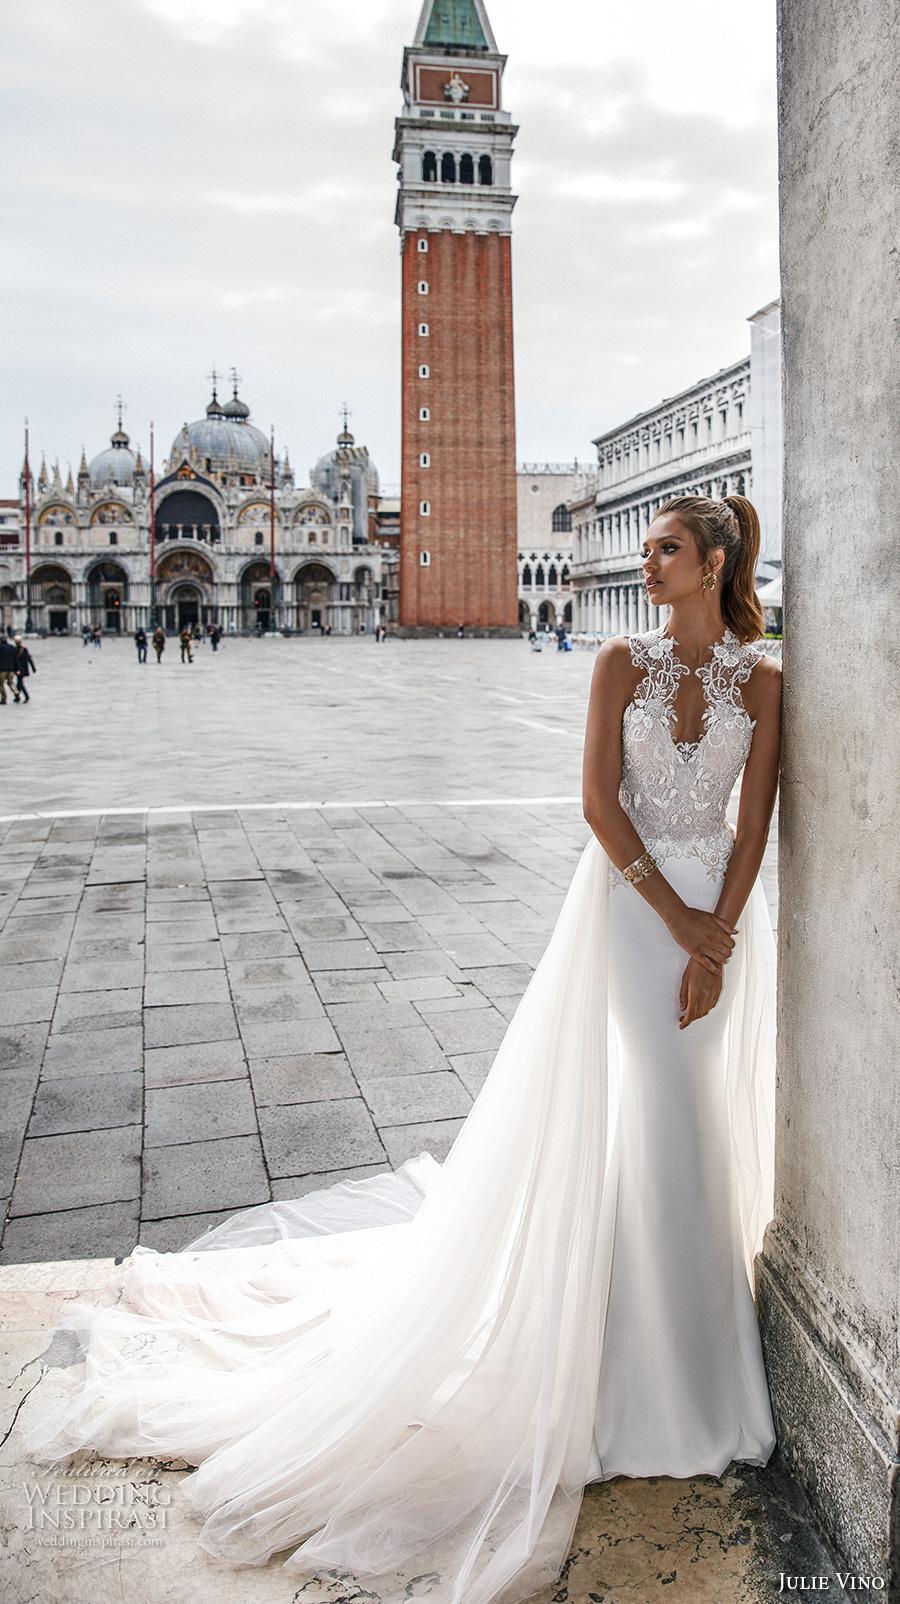 Julie Vino Spring 2018 Wedding Dresses  Venezia Bridal Collection  Wedding Inspirasi